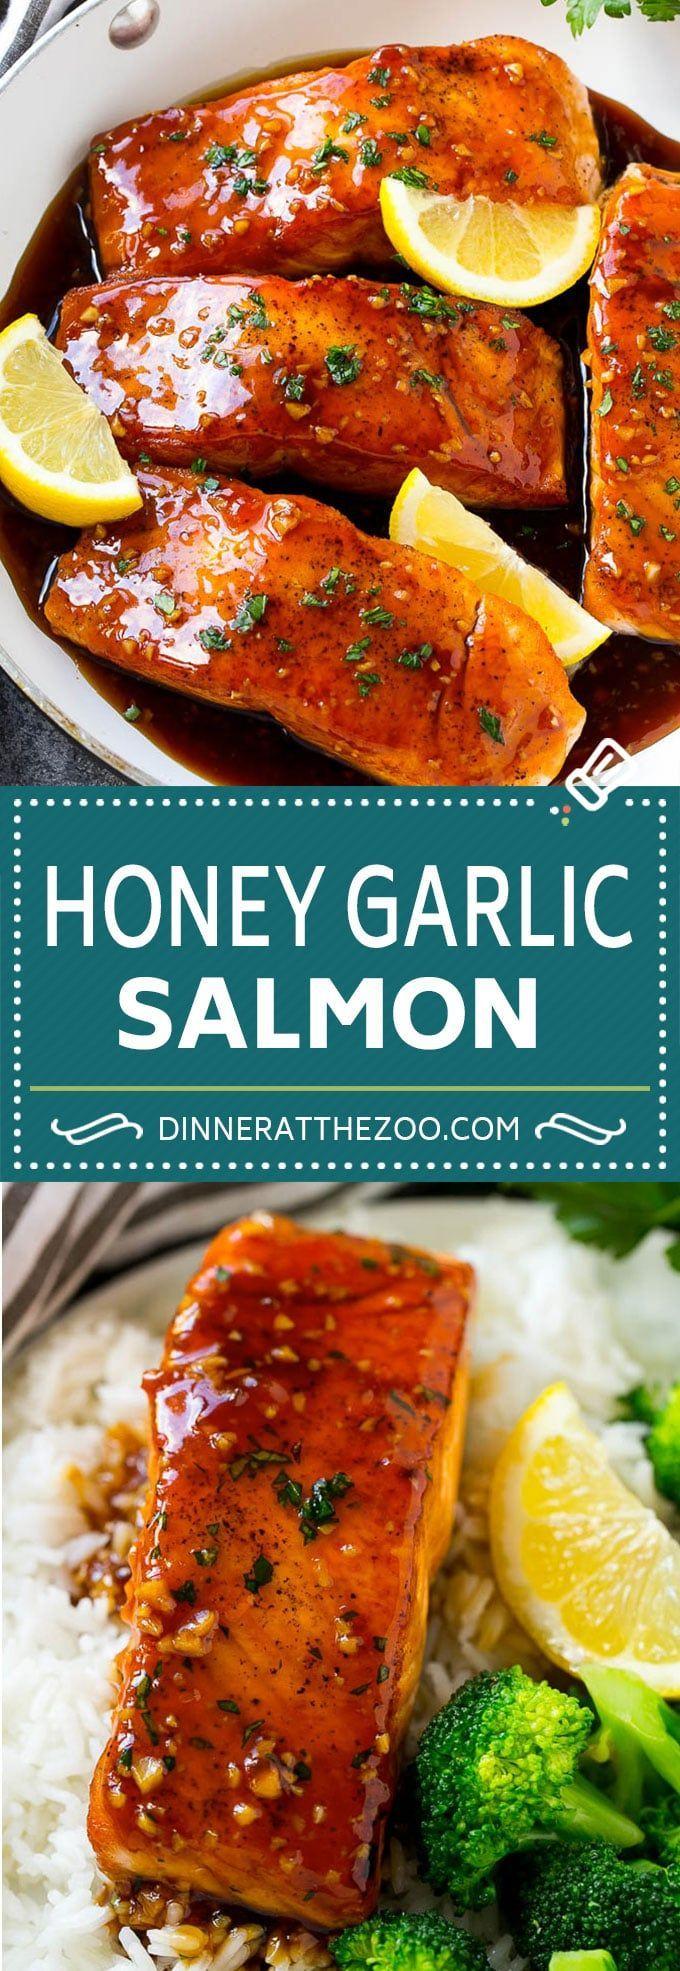 Honey Garlic Salmon Recipe | Asian Salmon Recipe | Healthy Salmon Recipe http://cookingmagic.net/category/recipes